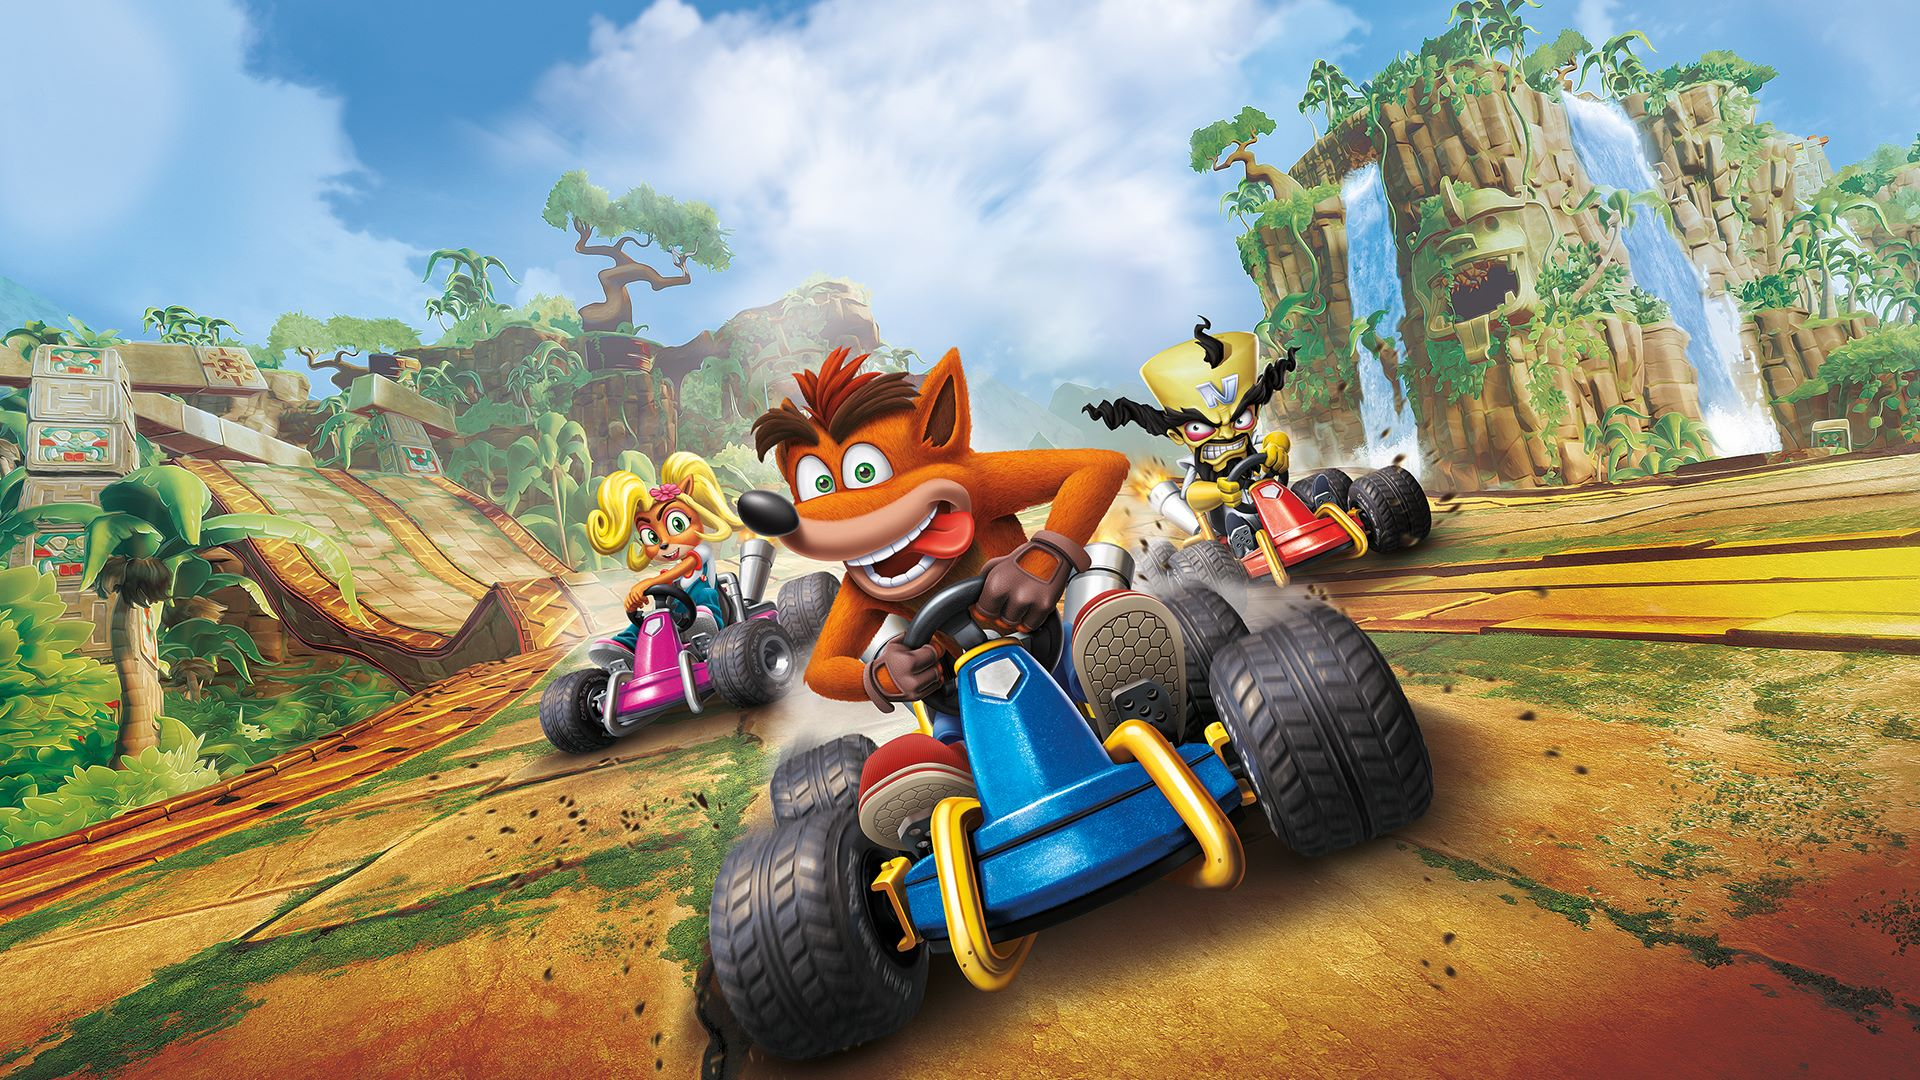 Buy Crash Team Racing Nitro Fueled   Microsoft Store en AU 1920x1080